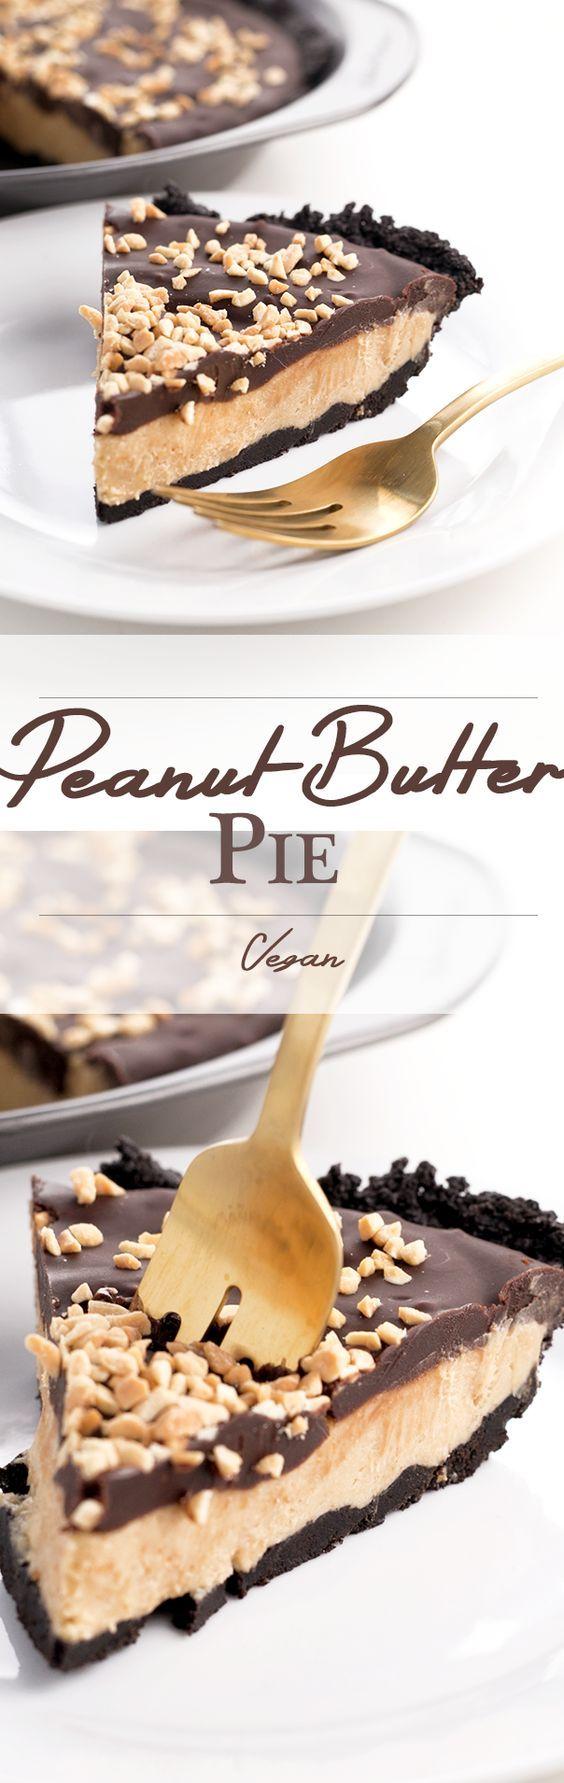 Vegan Oreo Peanut Butter Pie - No Bake/ Simple To Make! vegan peanut pie chocolate dessert (Butter Pie Thanksgiving)